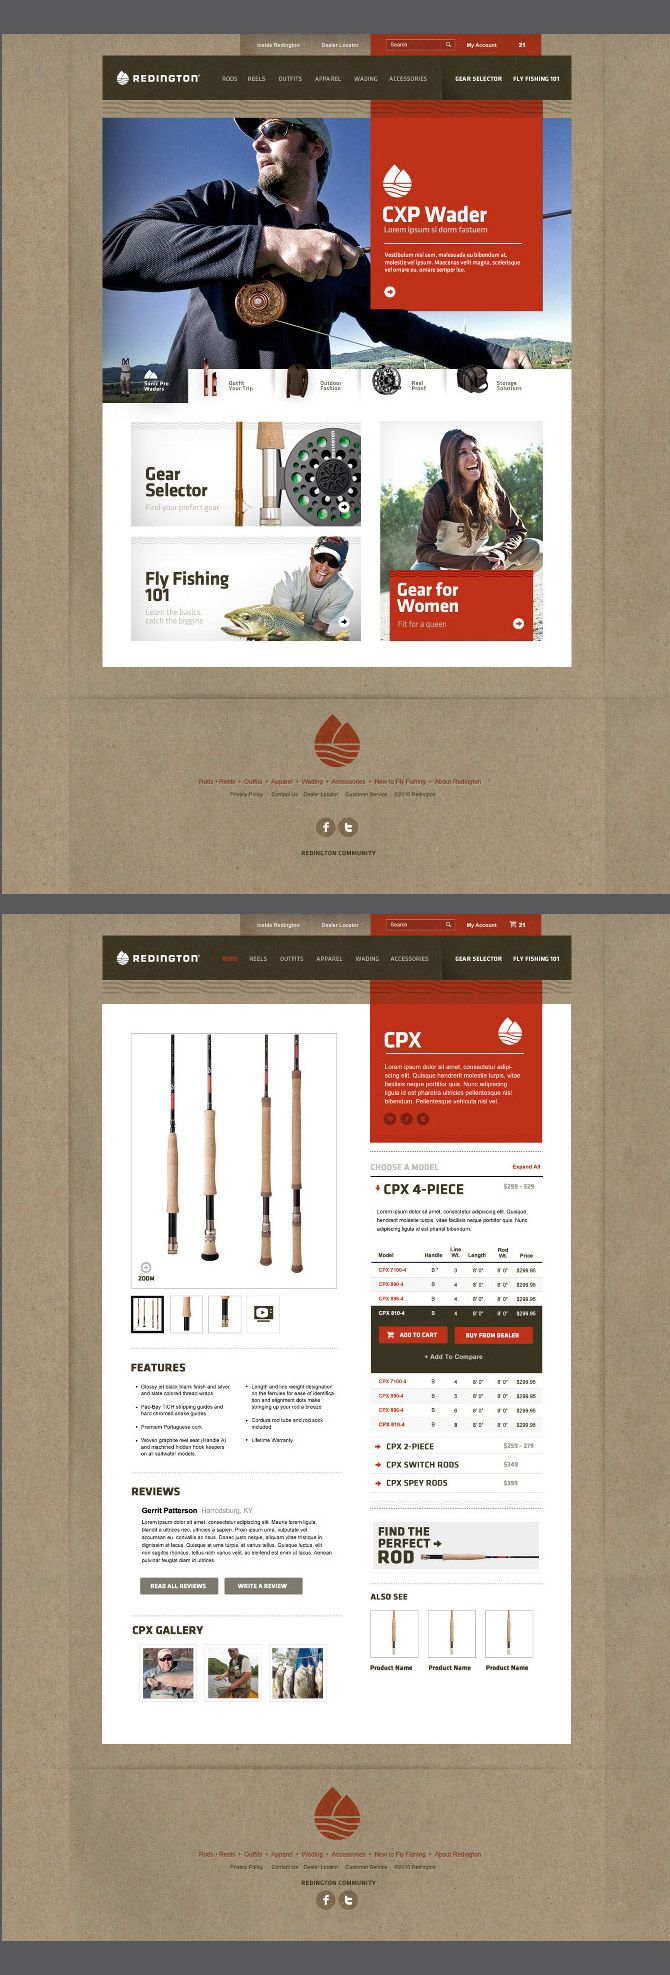 #web, #grid | #inspiration #web #design #layout #userinterface #website #webdesign <<< repinned by www.BlickeDeeler.de Follow us on Facebook  >>> www.facebook.com/BlickeDeeler